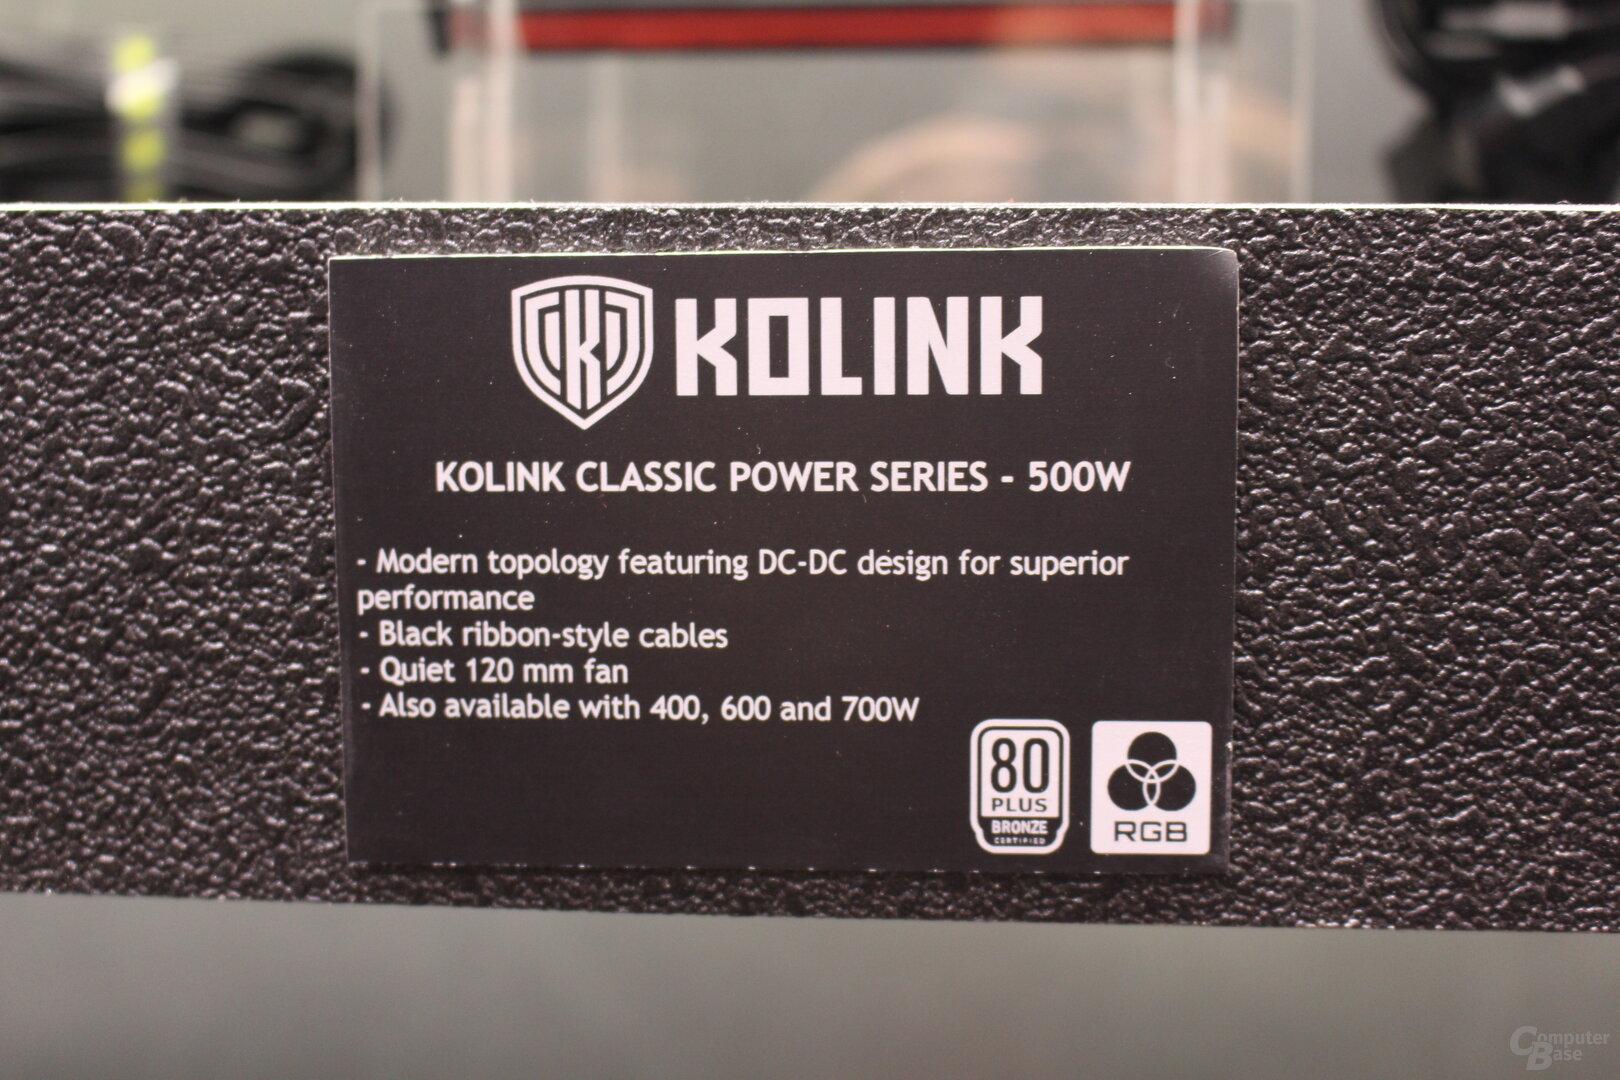 Kolink Classic Power Series